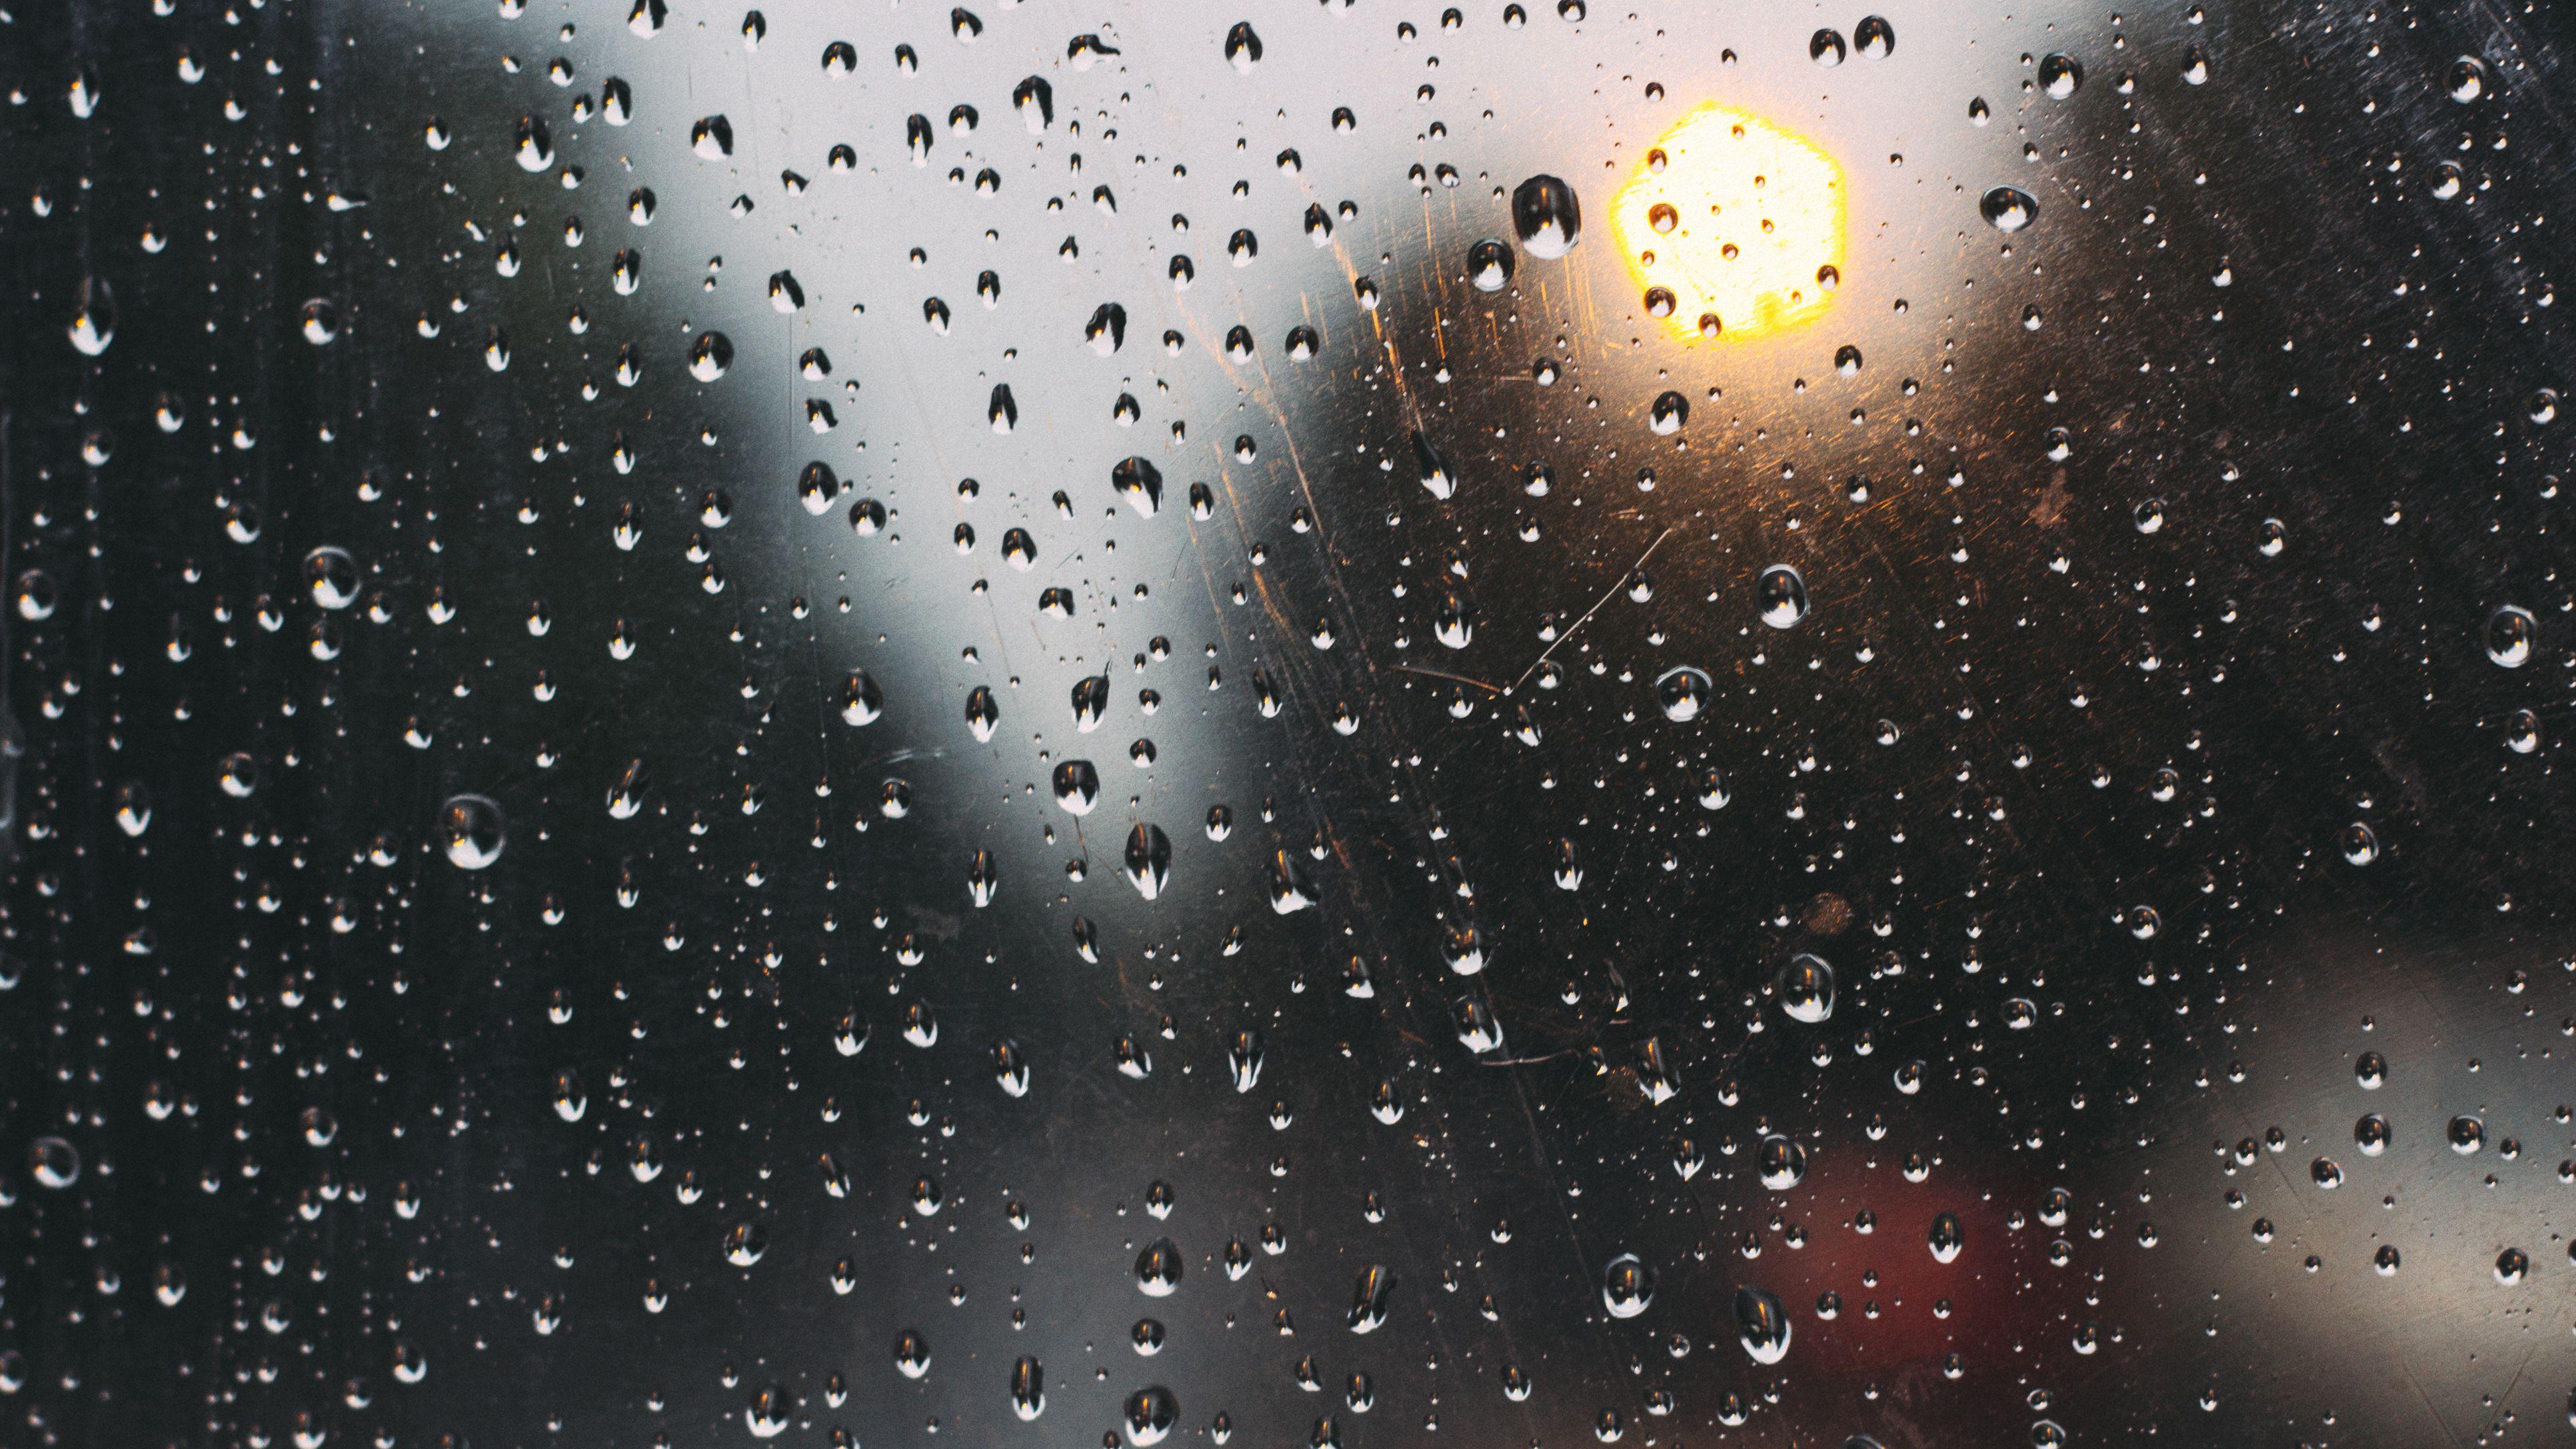 Rain Sky Images, Stock Photos & Vectors | Shutterstock | 2174x3865